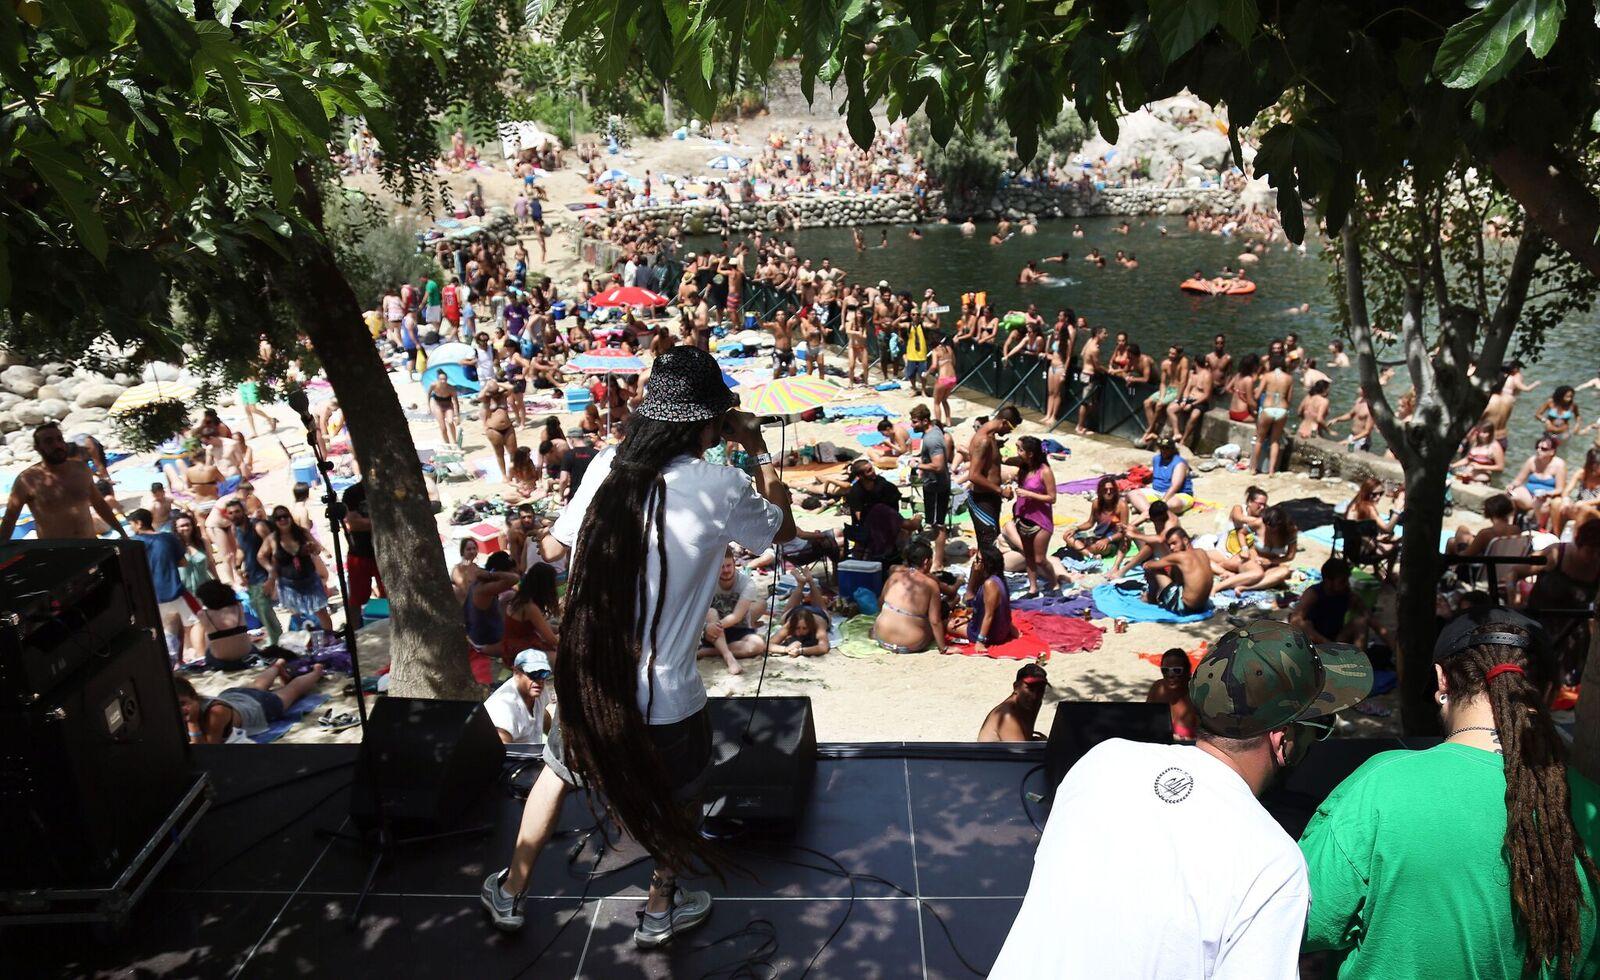 El v shikillo festival de candeleda se completa con molotov for Candeleda piscinas naturales